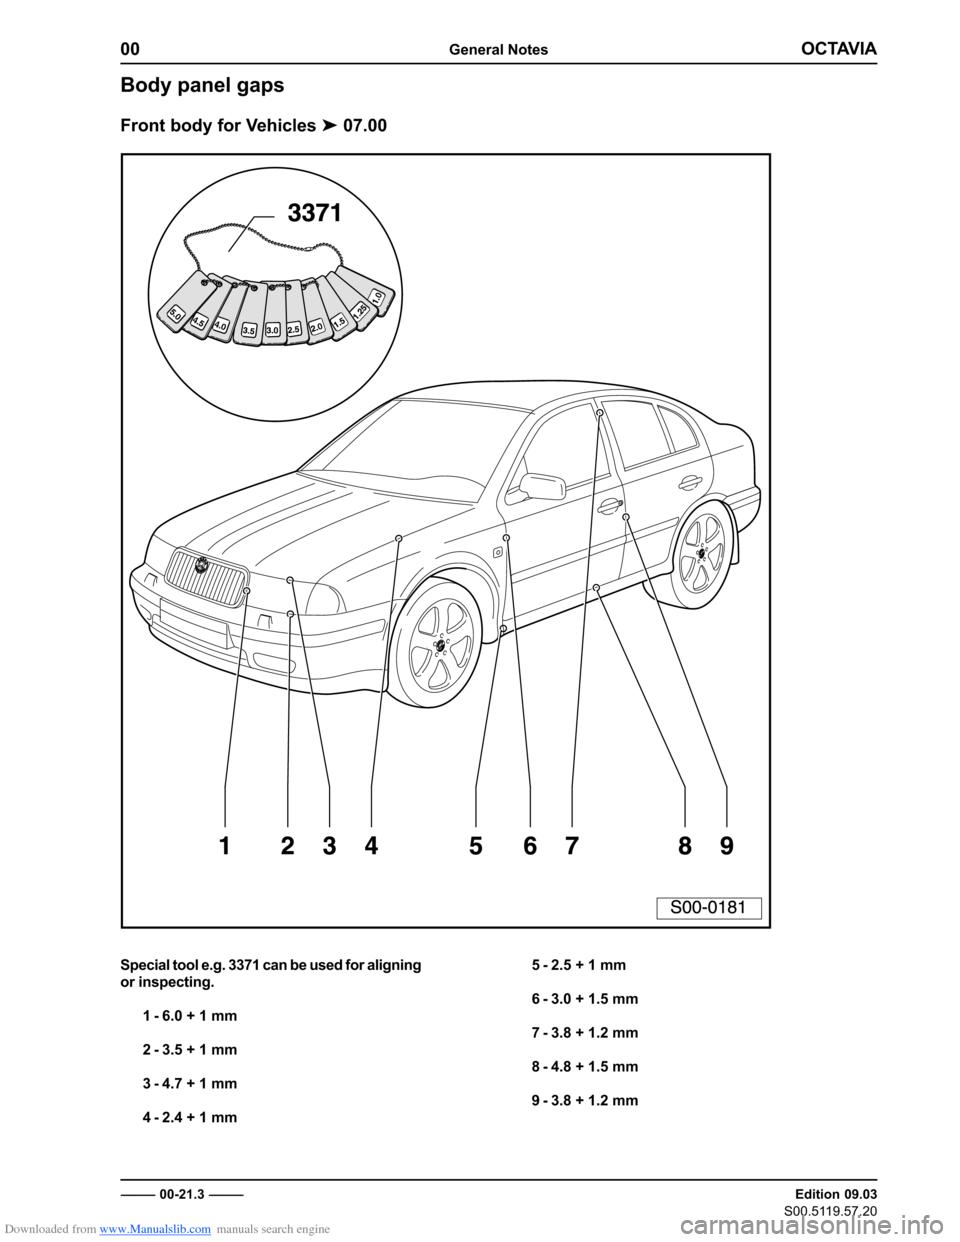 SKODA OCTAVIA 1997 1.G / (1U) Body Repairs Workshop Manual